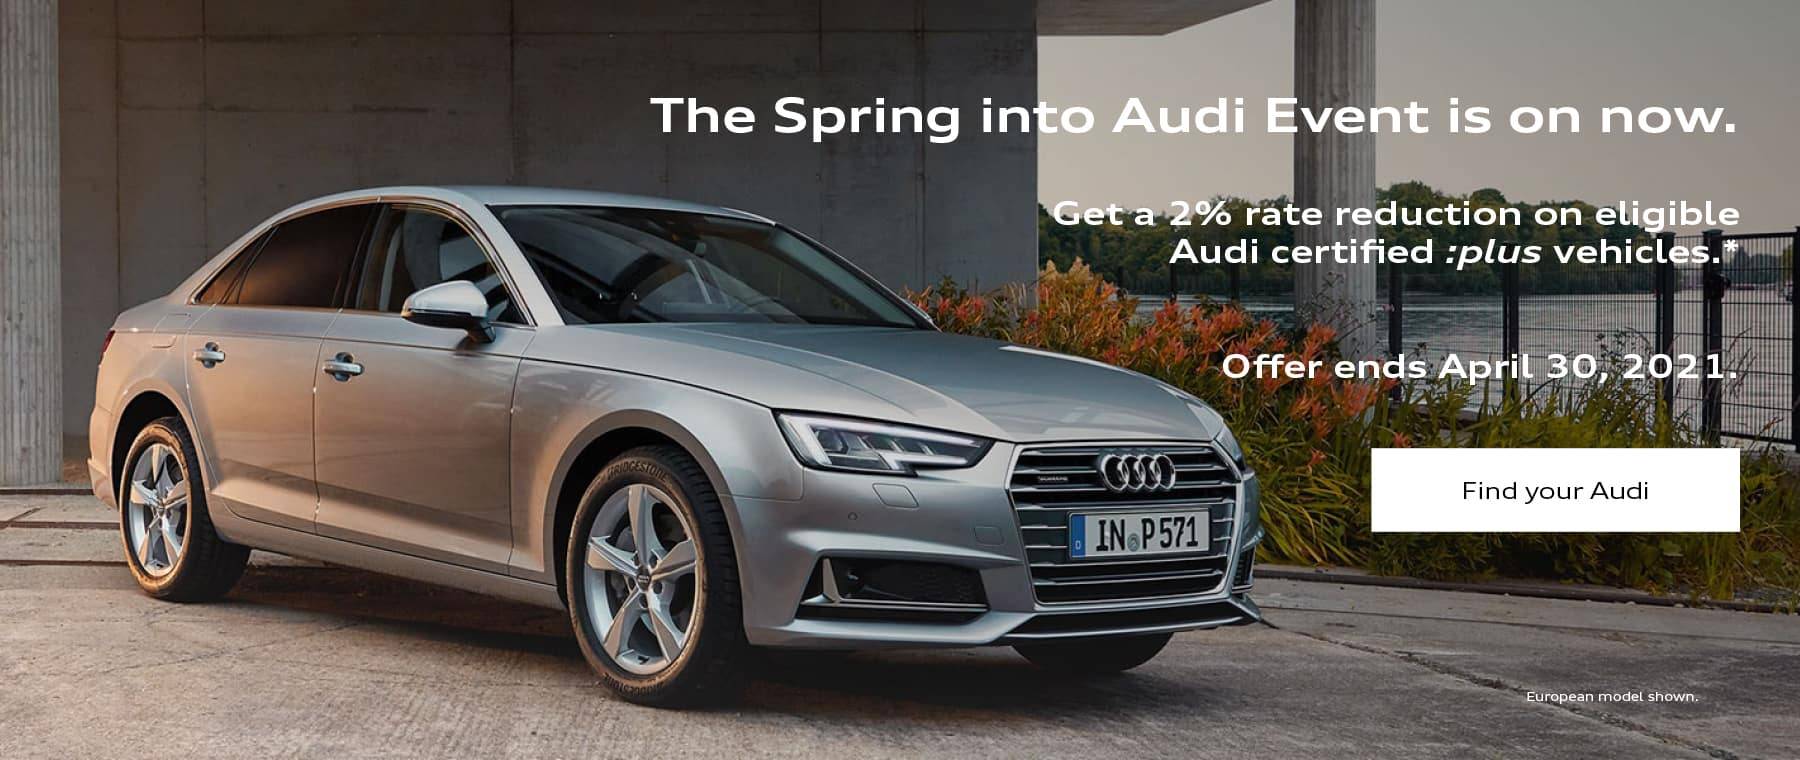 1571864_AWG_CPO Spring into Audi WB